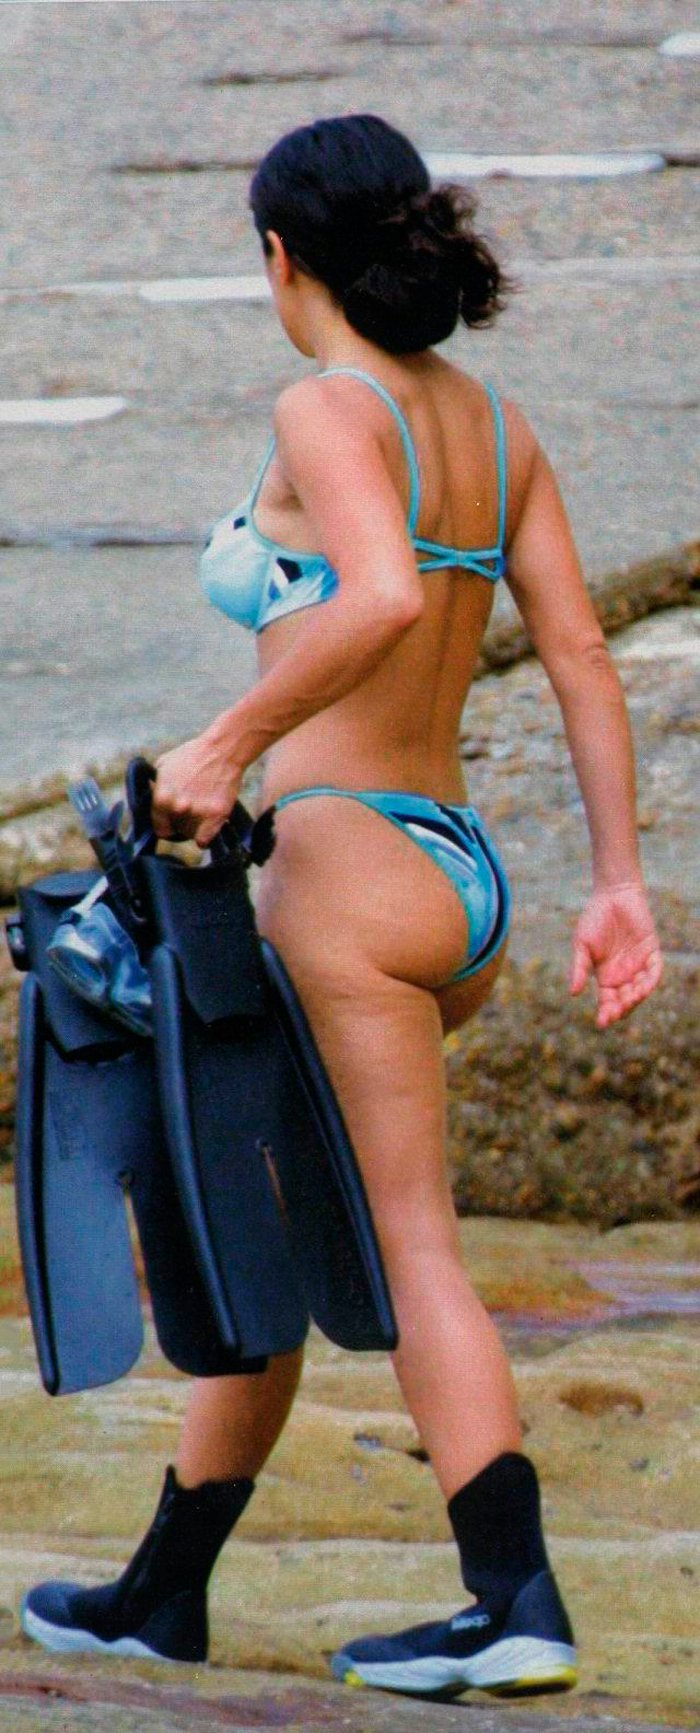 Salma Hayek fotos bikini vacaciones 2